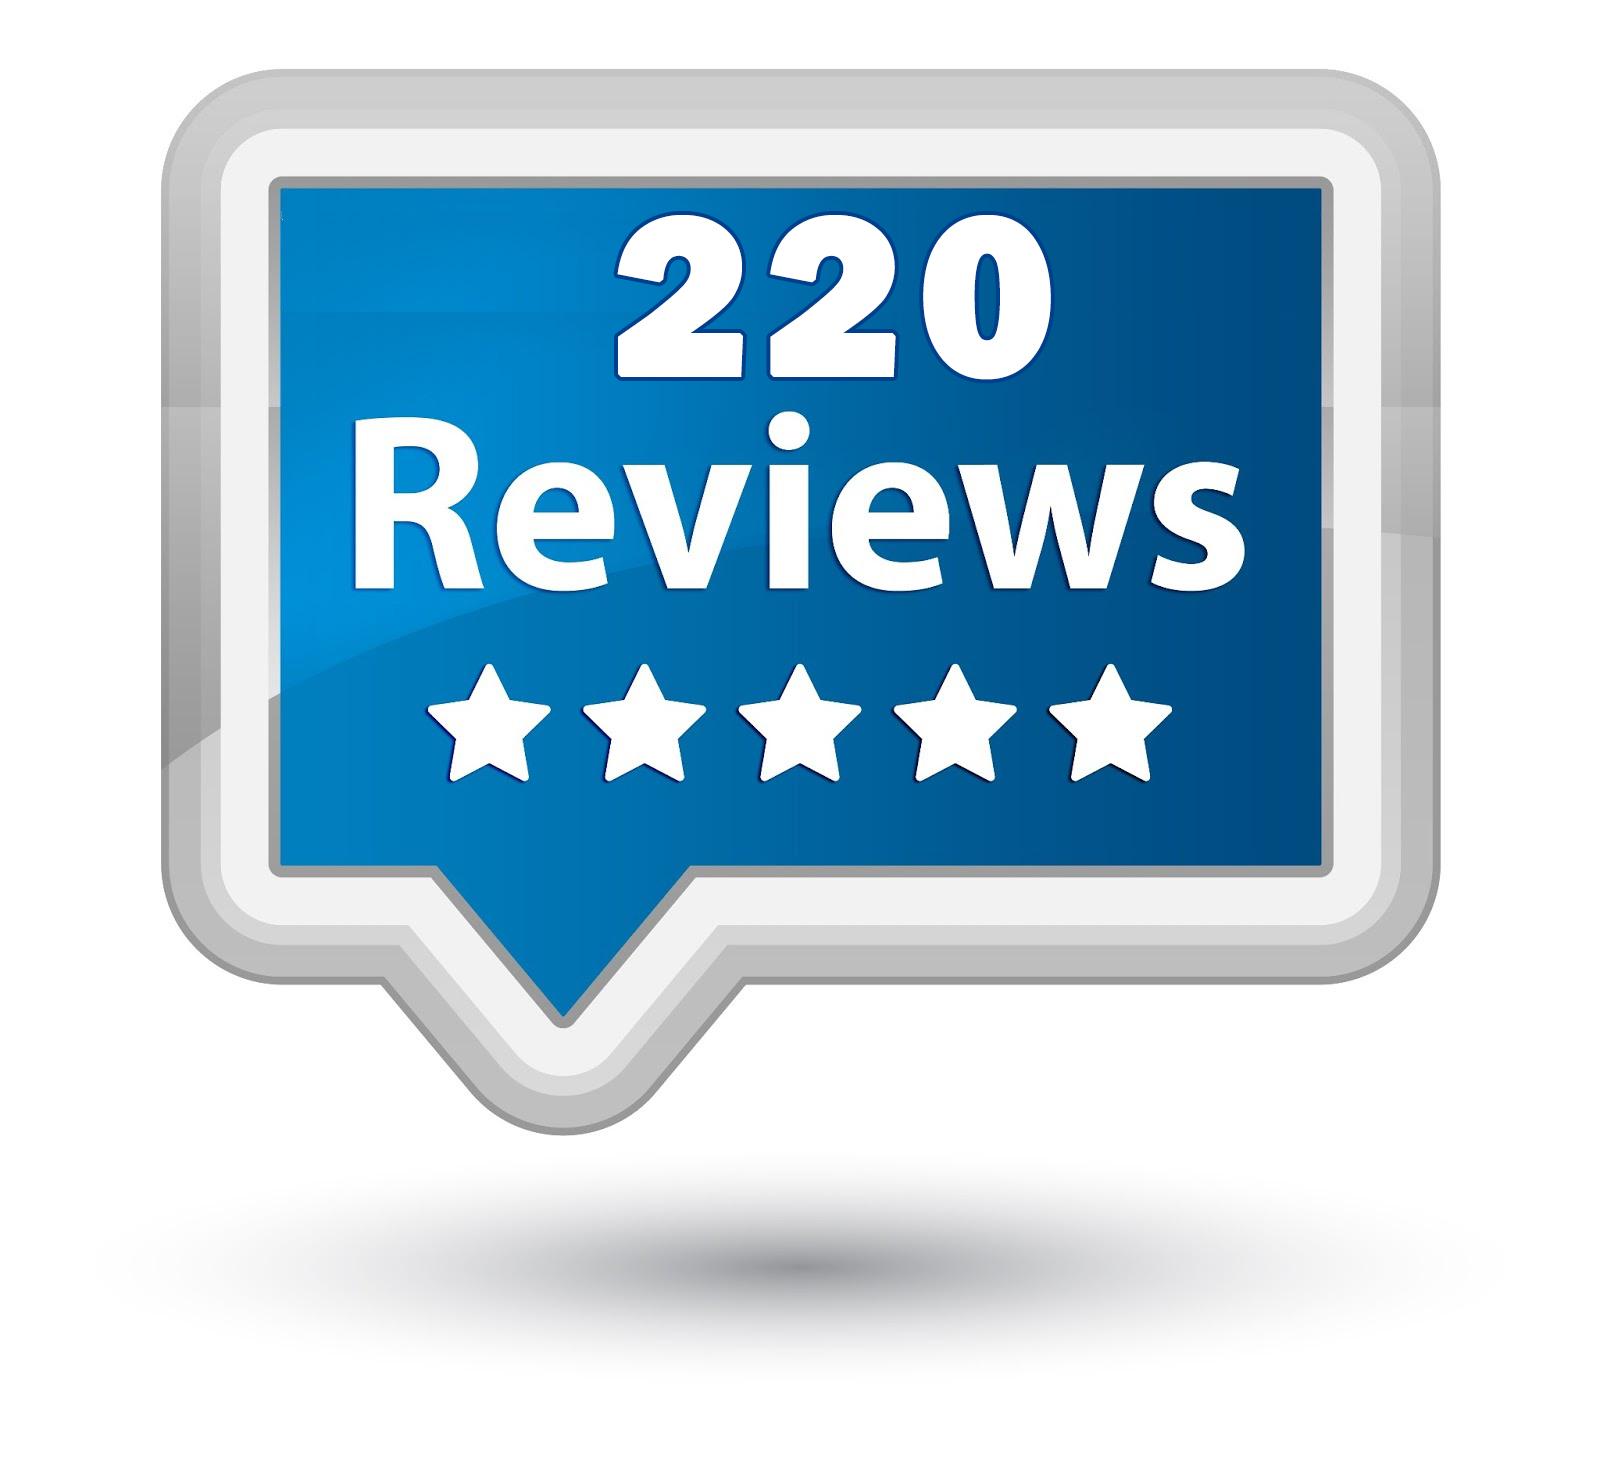 reviews-image.jpg